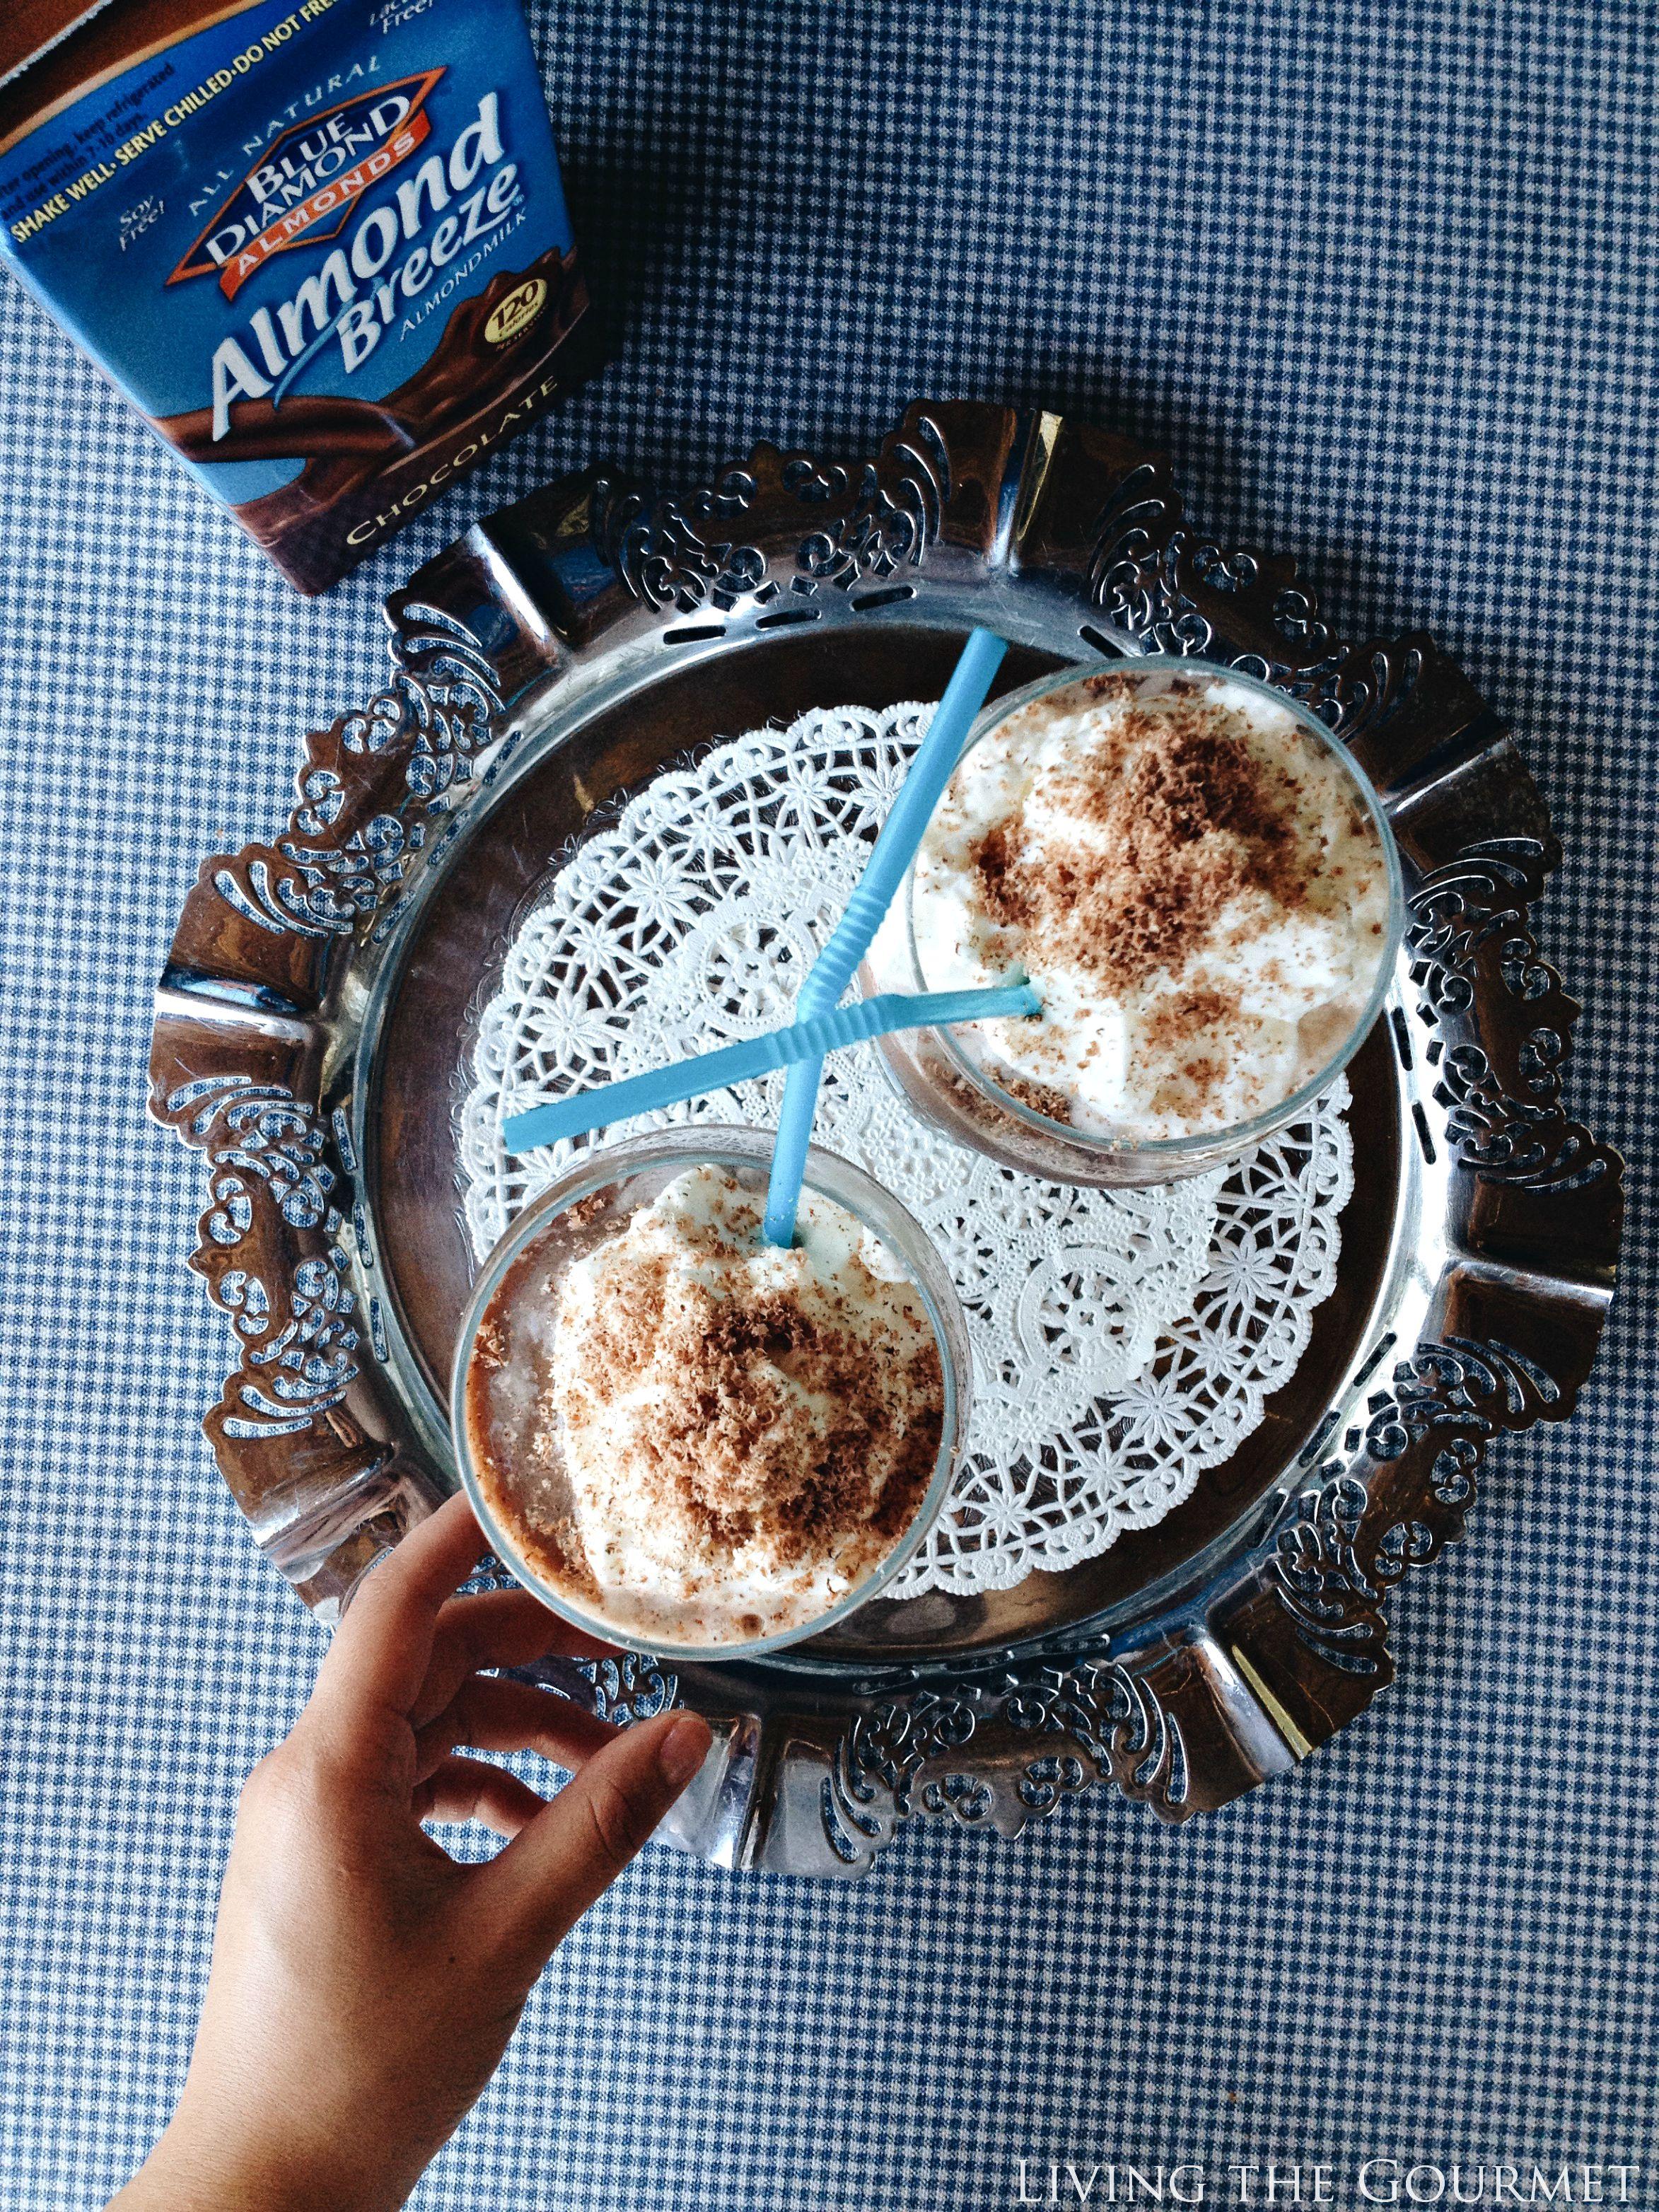 Living the Gourmet: Almond Milk Chocolate Frosty